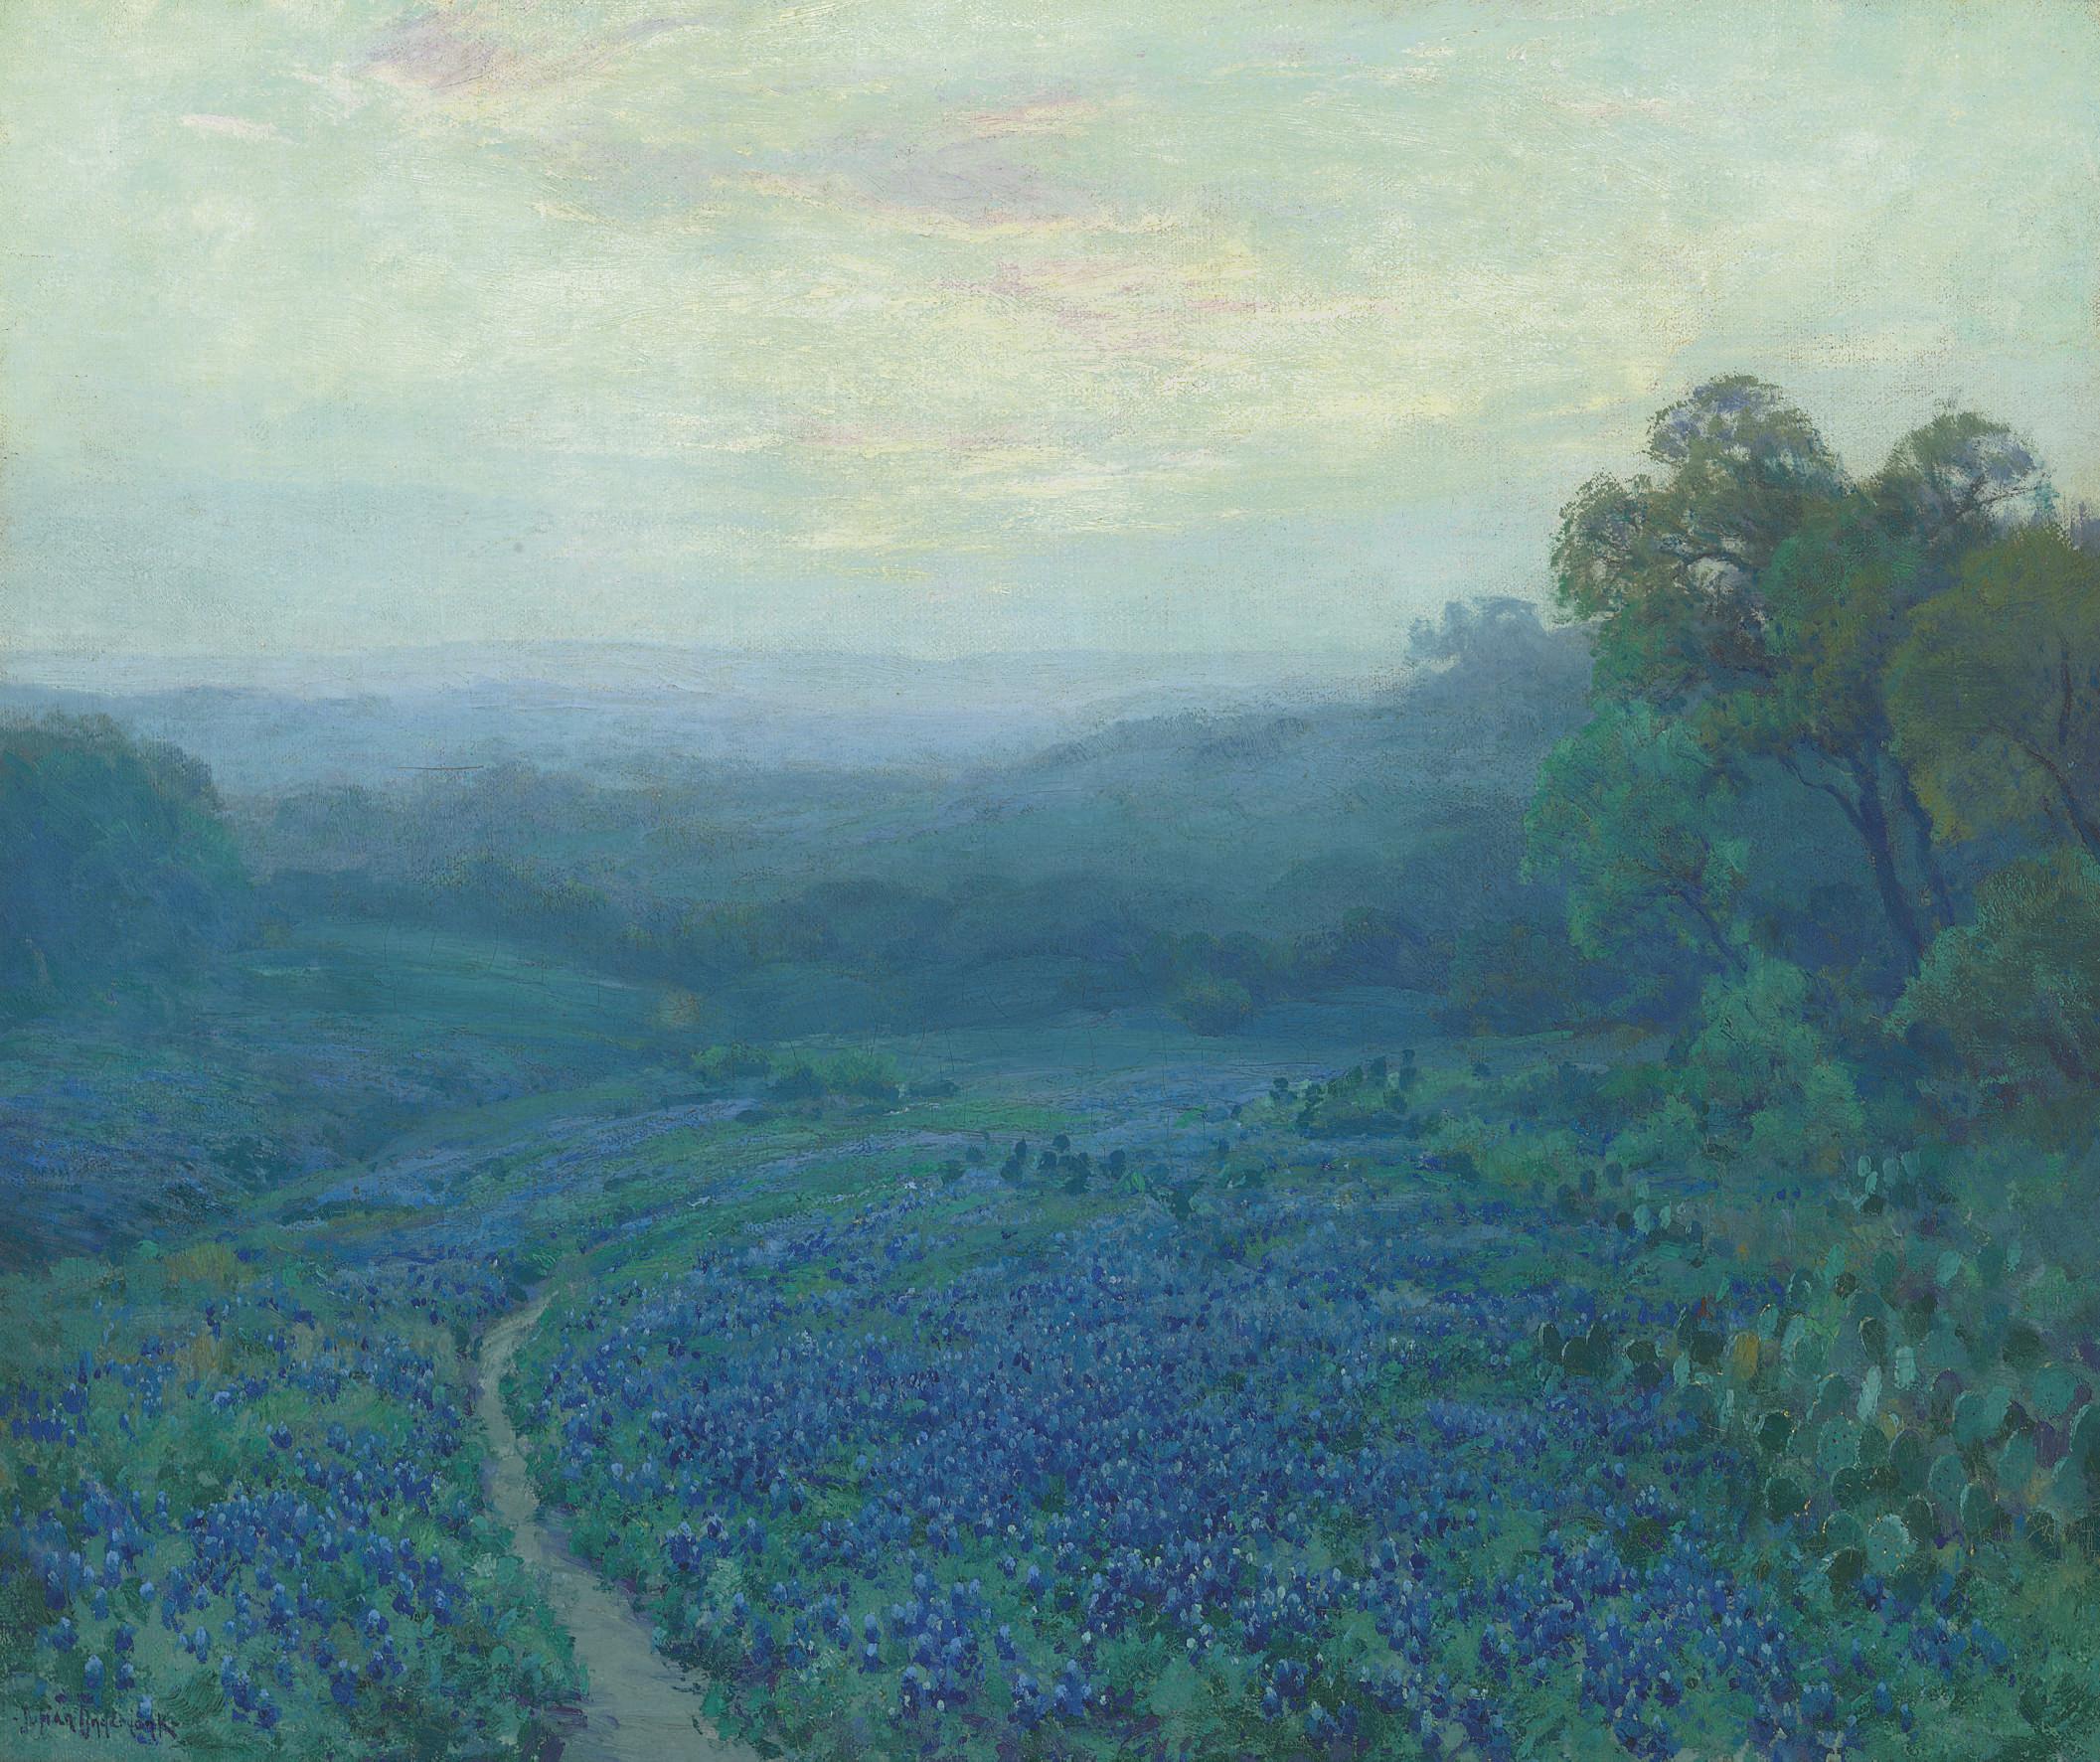 Path Through a Field of Bluebonnets